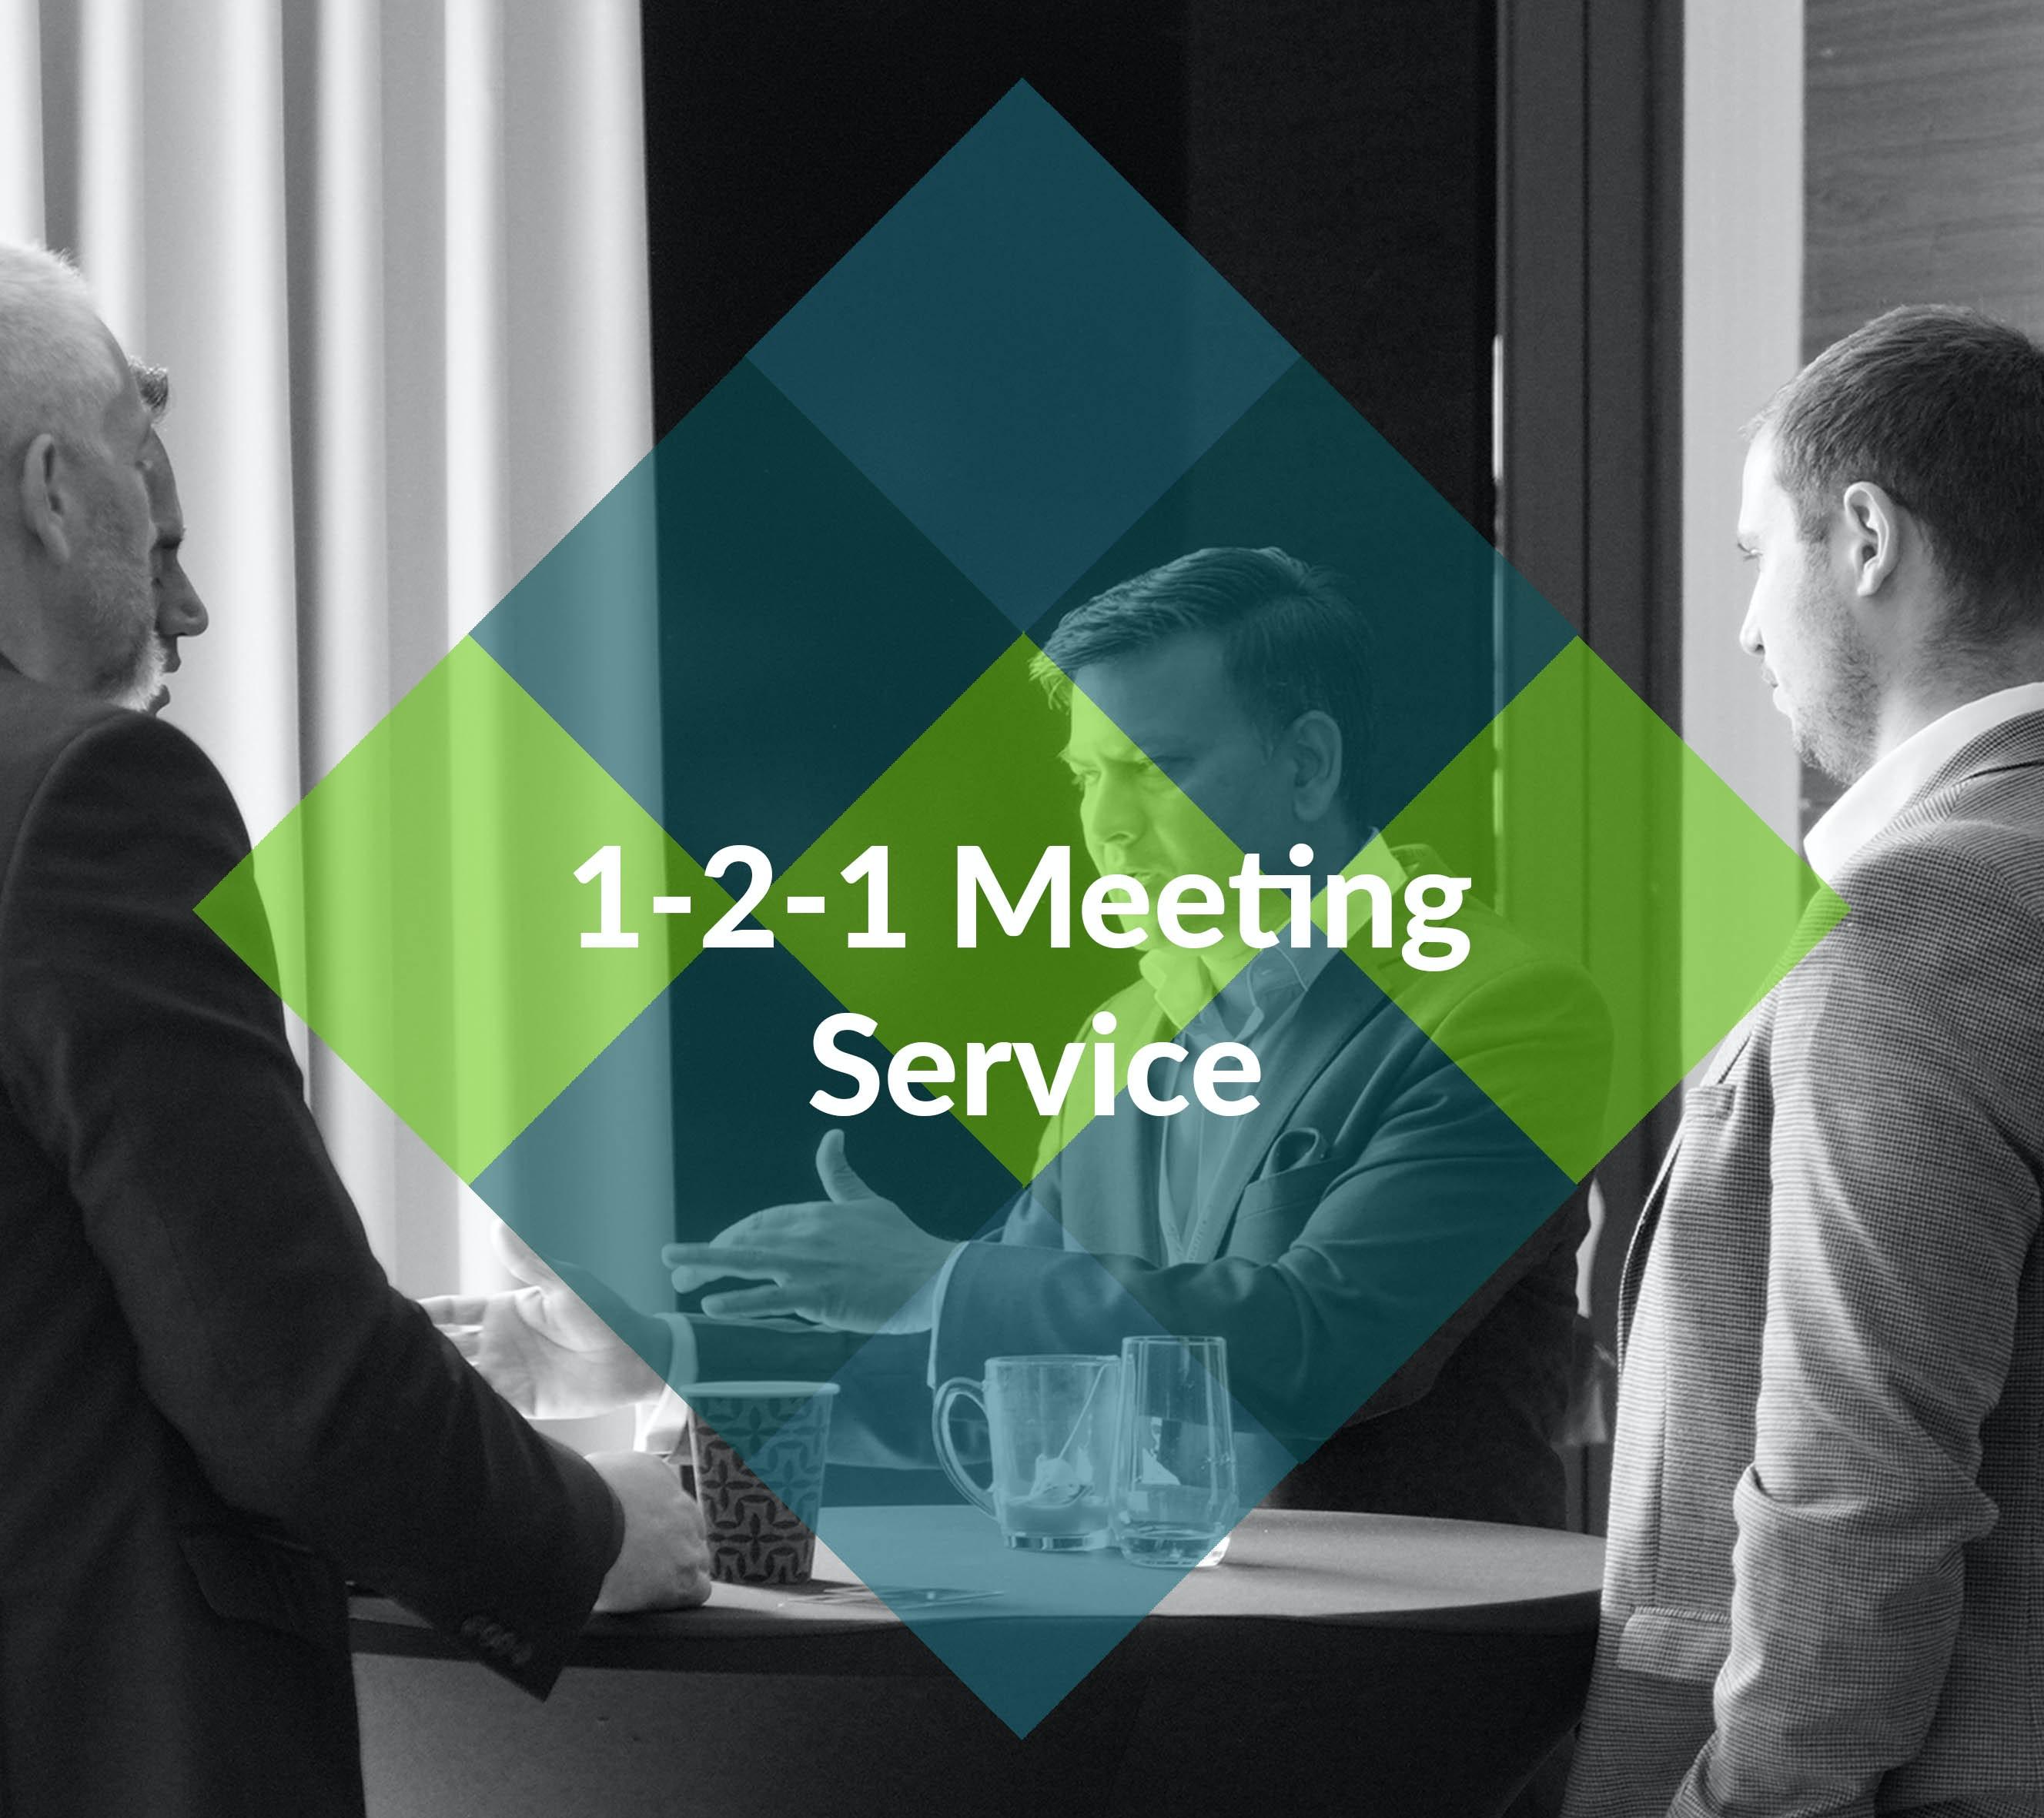 MVNOs Asia 1-2-1 Meeting service